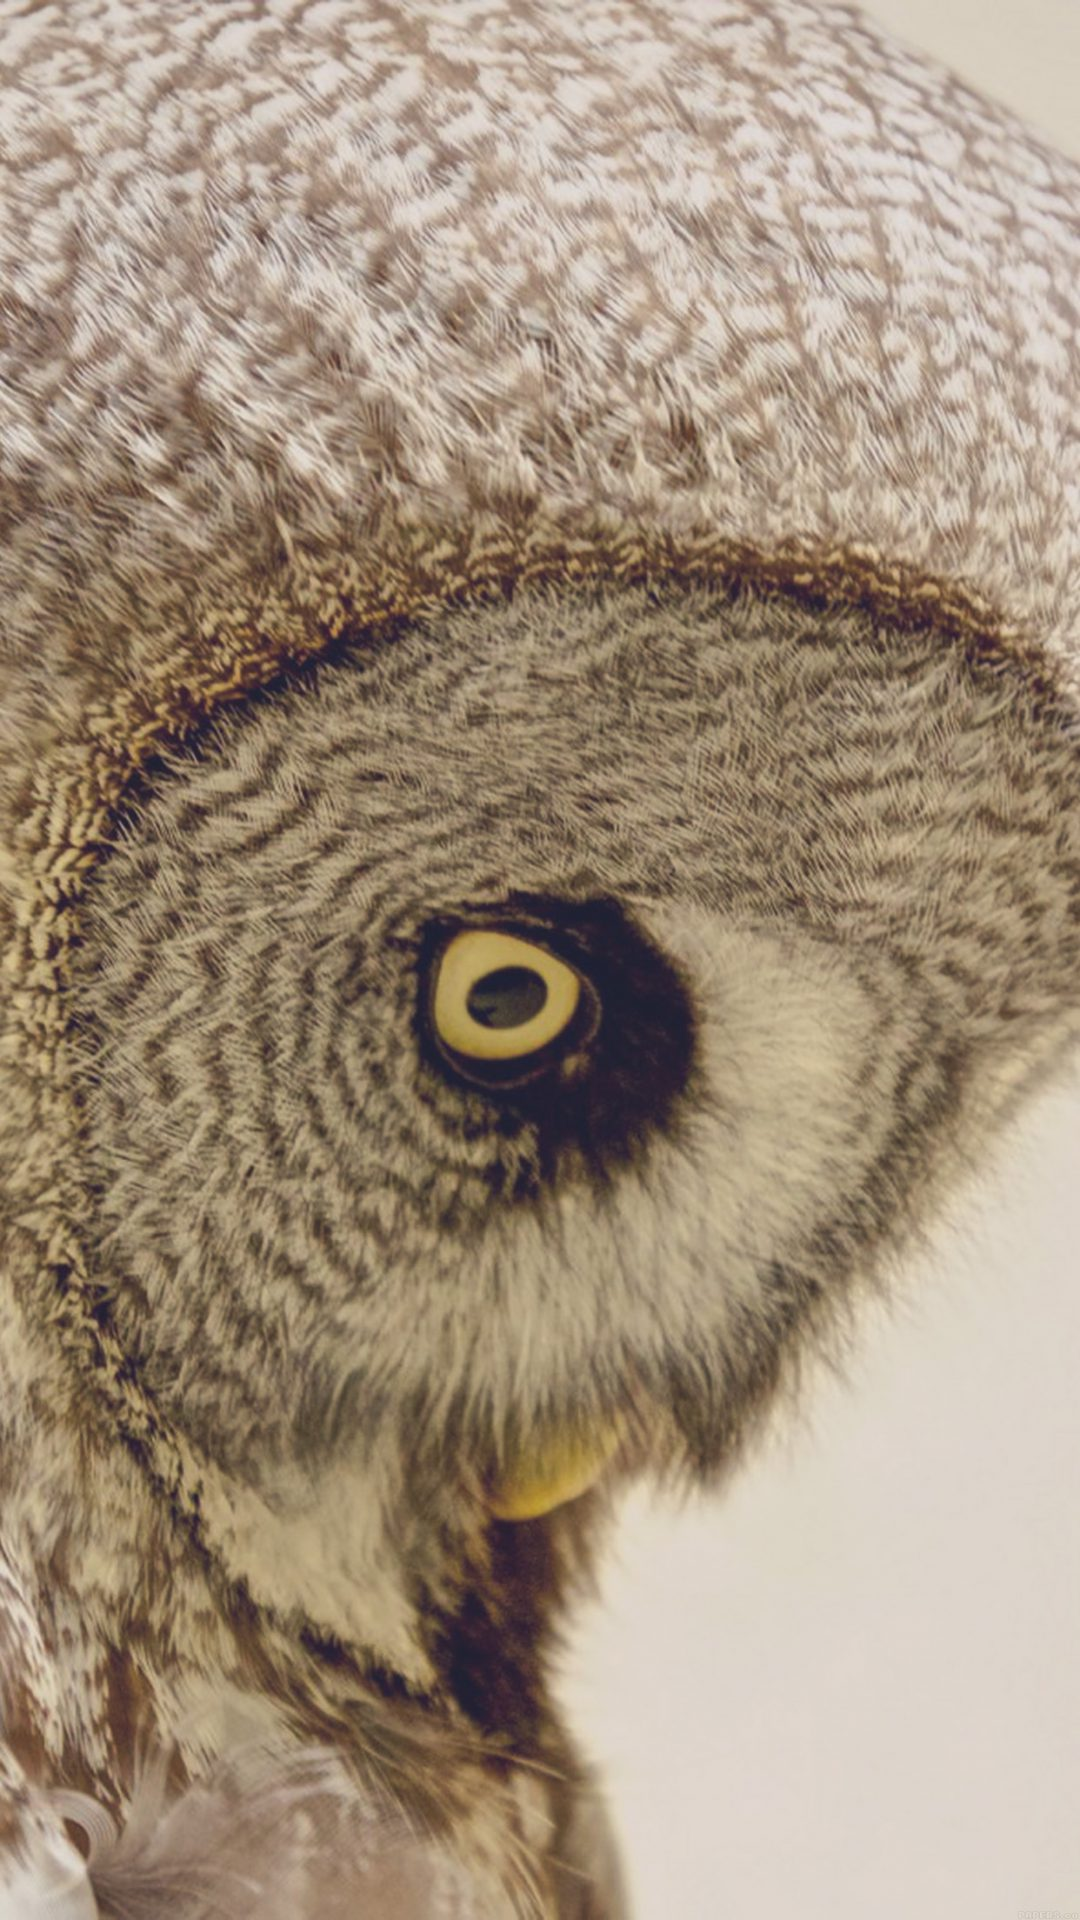 Owl Eye Animal Nature